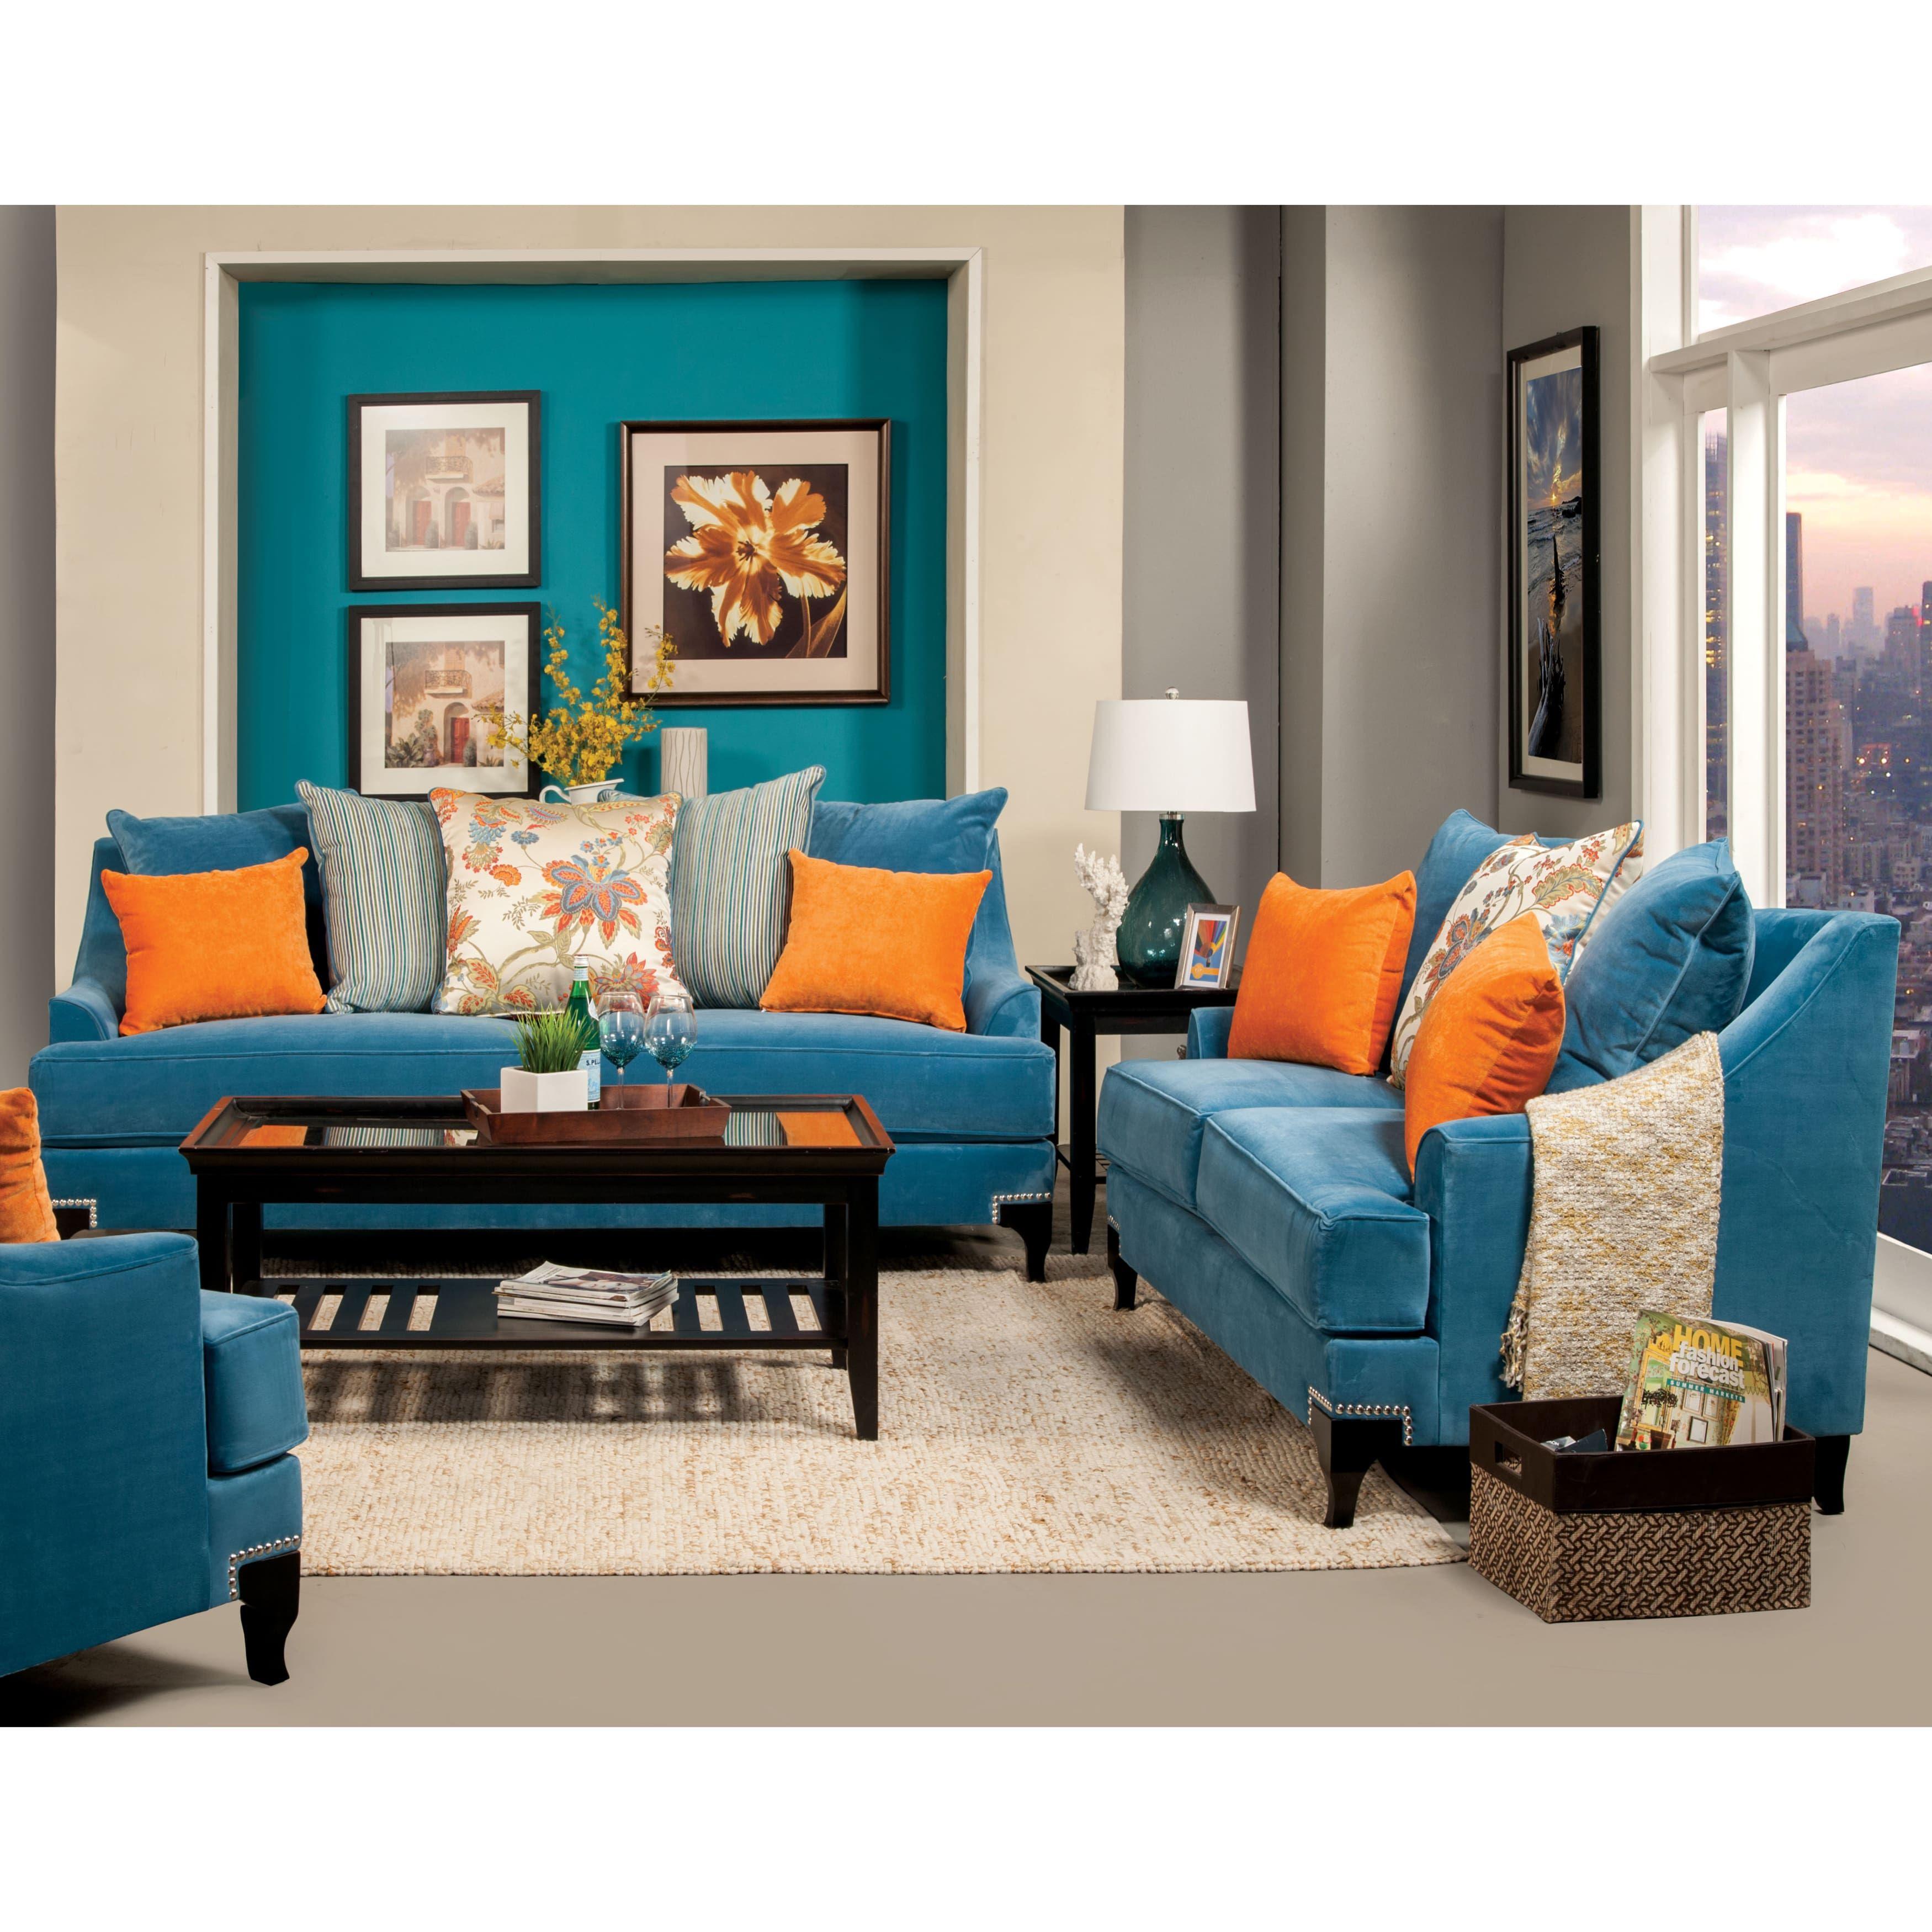 Furniture Of America Estella Retro Peacock Blue Sofa Living Room Orange Blue Living Room Living Room Sets